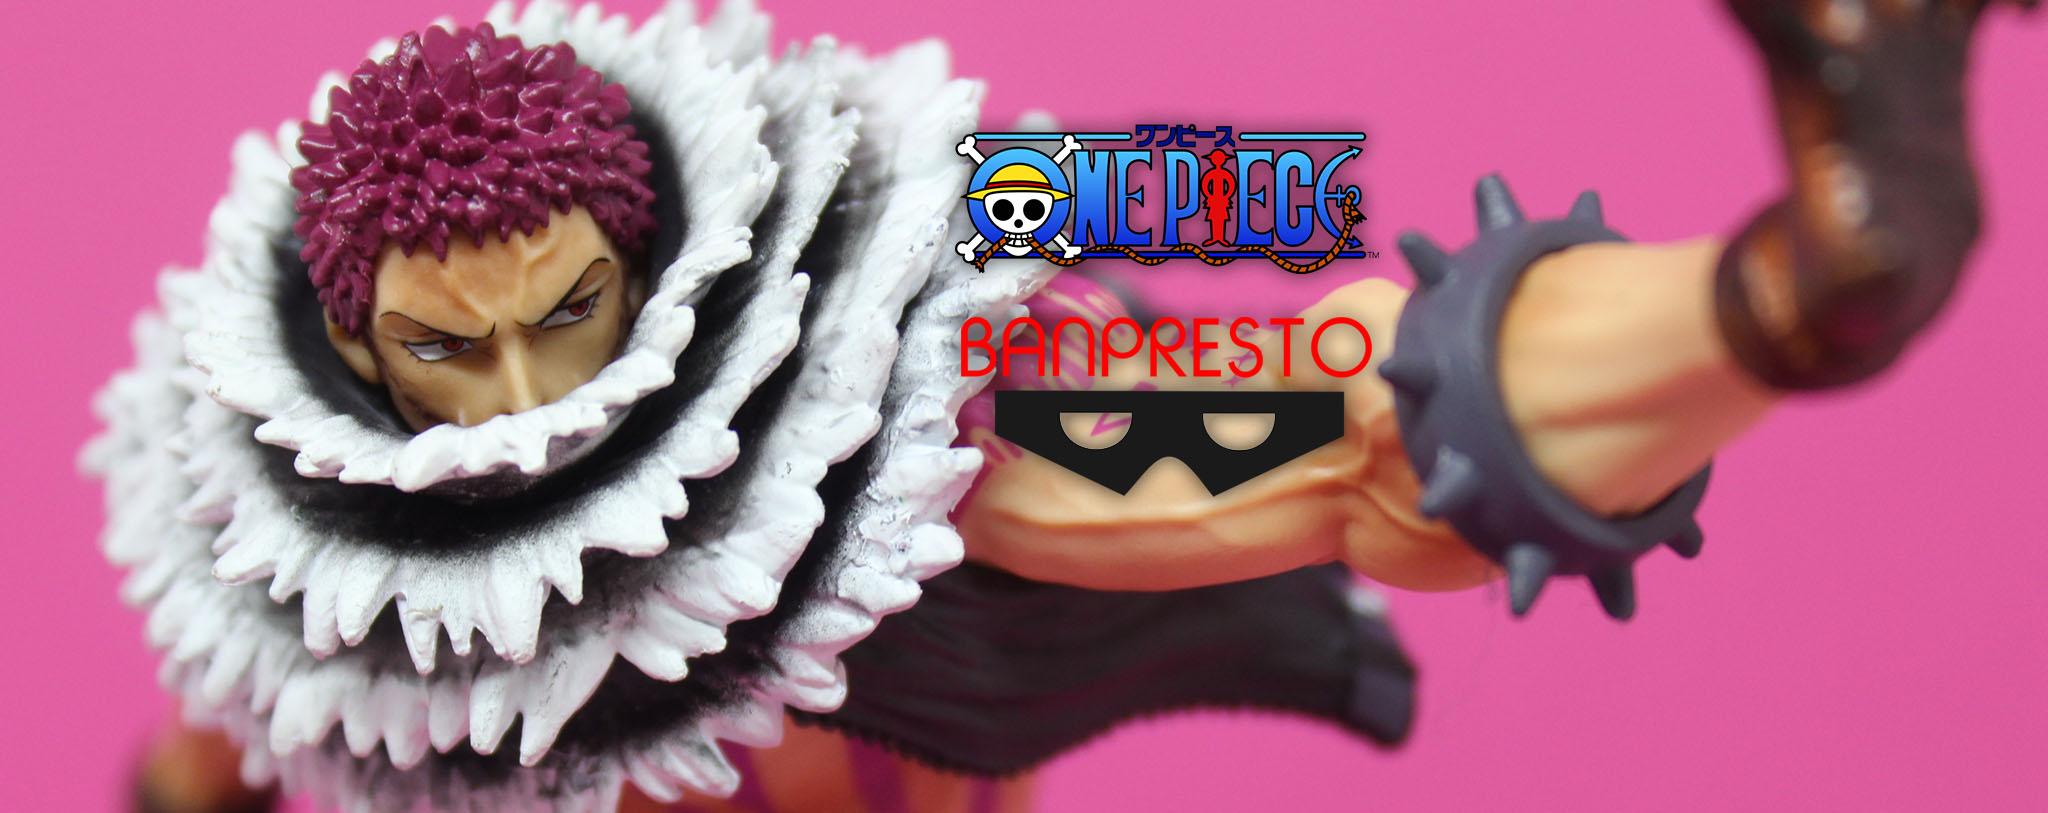 Charlotte Katakuri (One Piece) Banpresto: la recensione